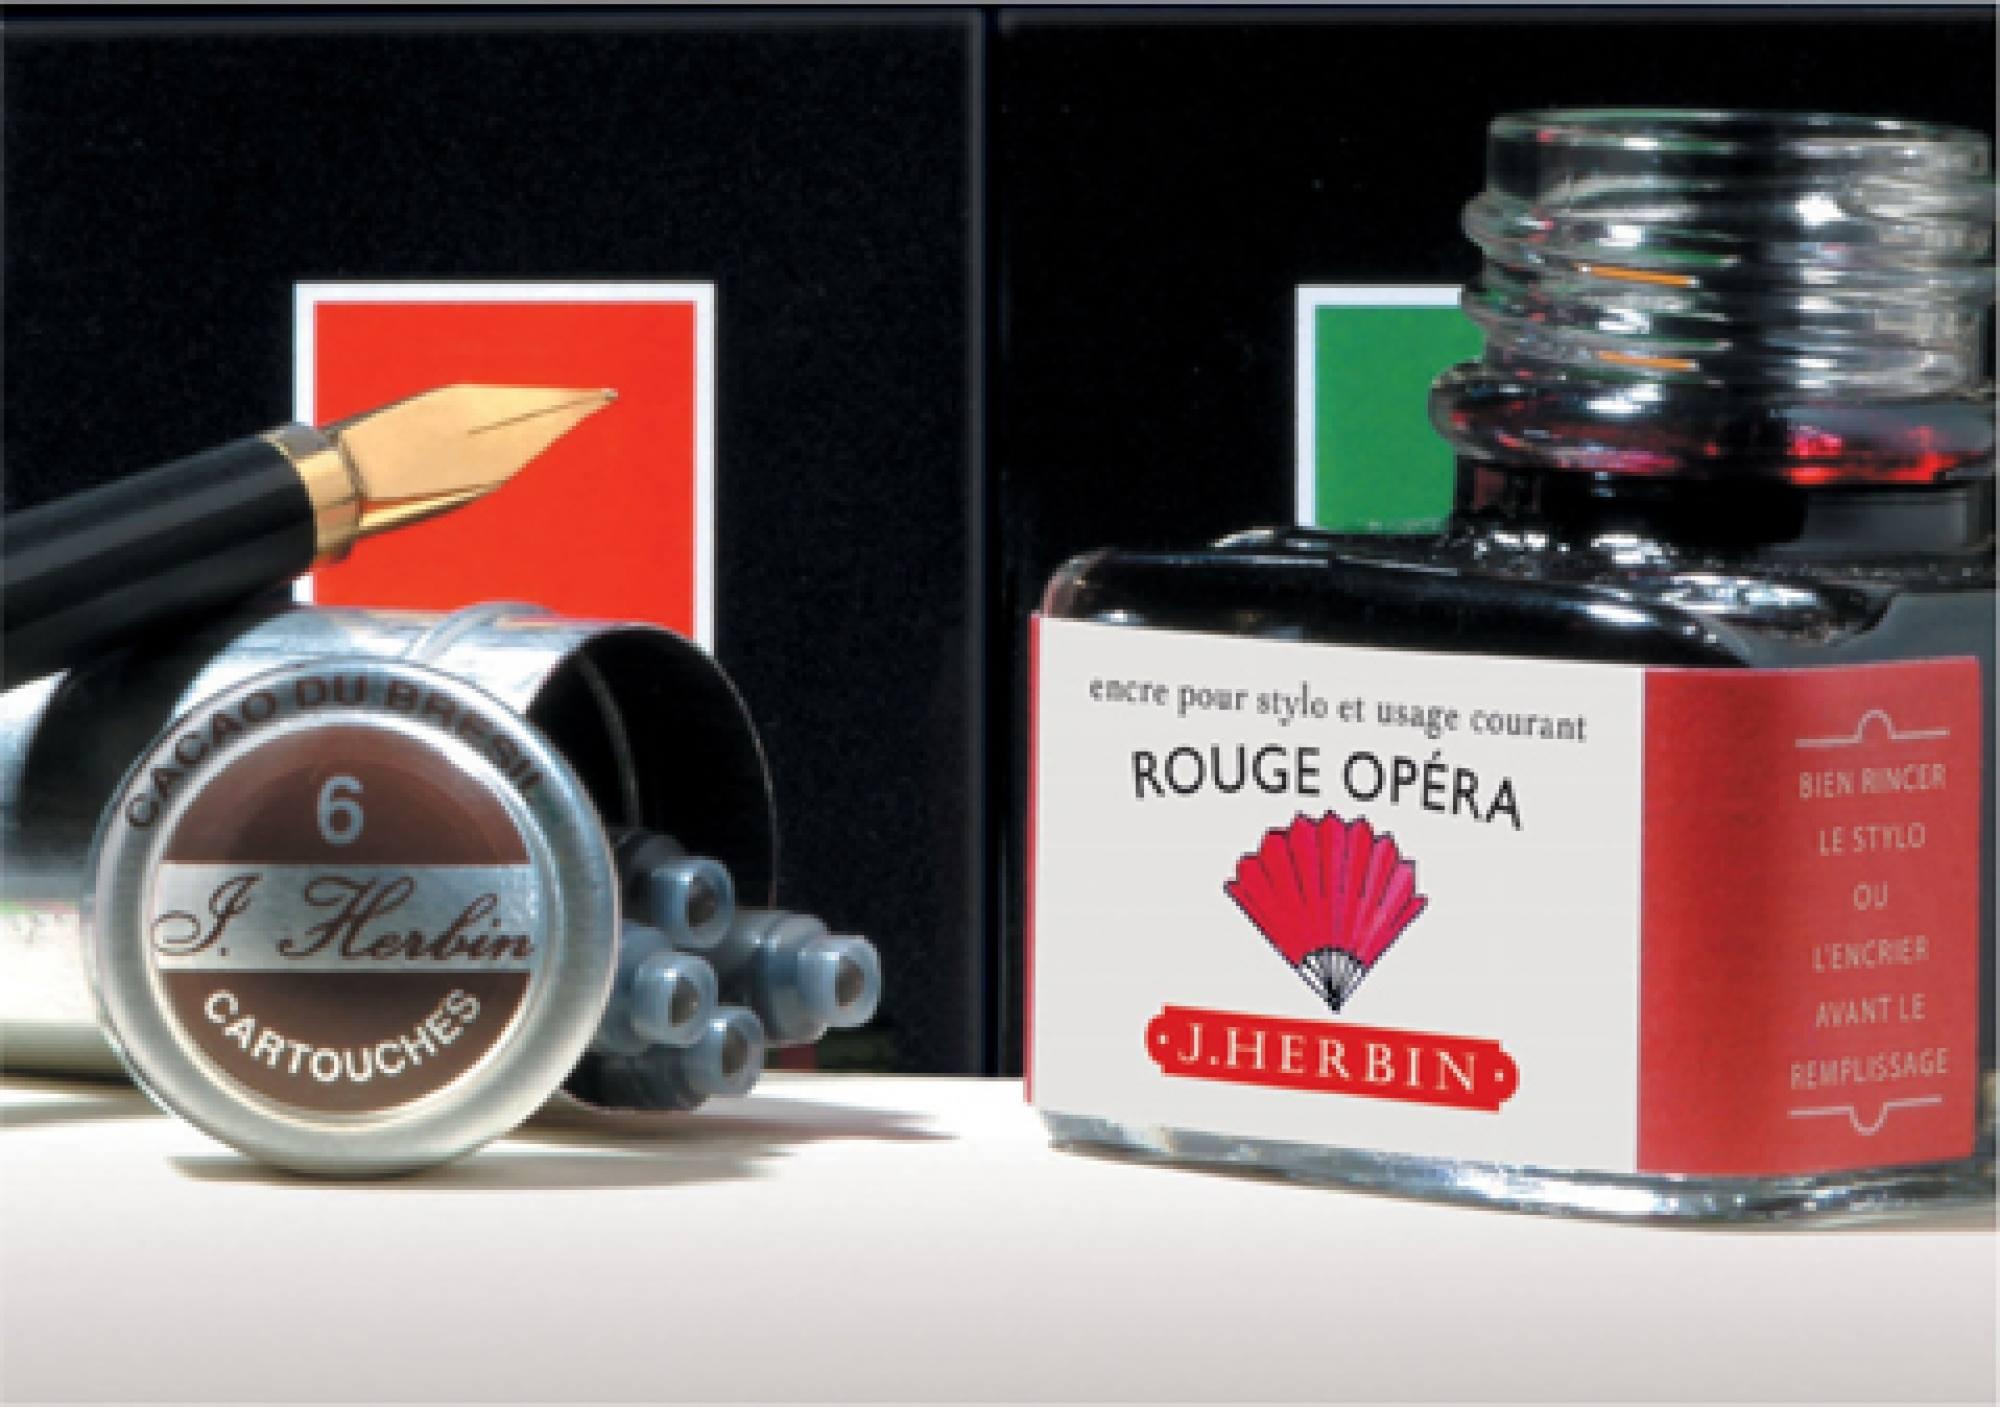 Brand Spotlight: J. Herbin